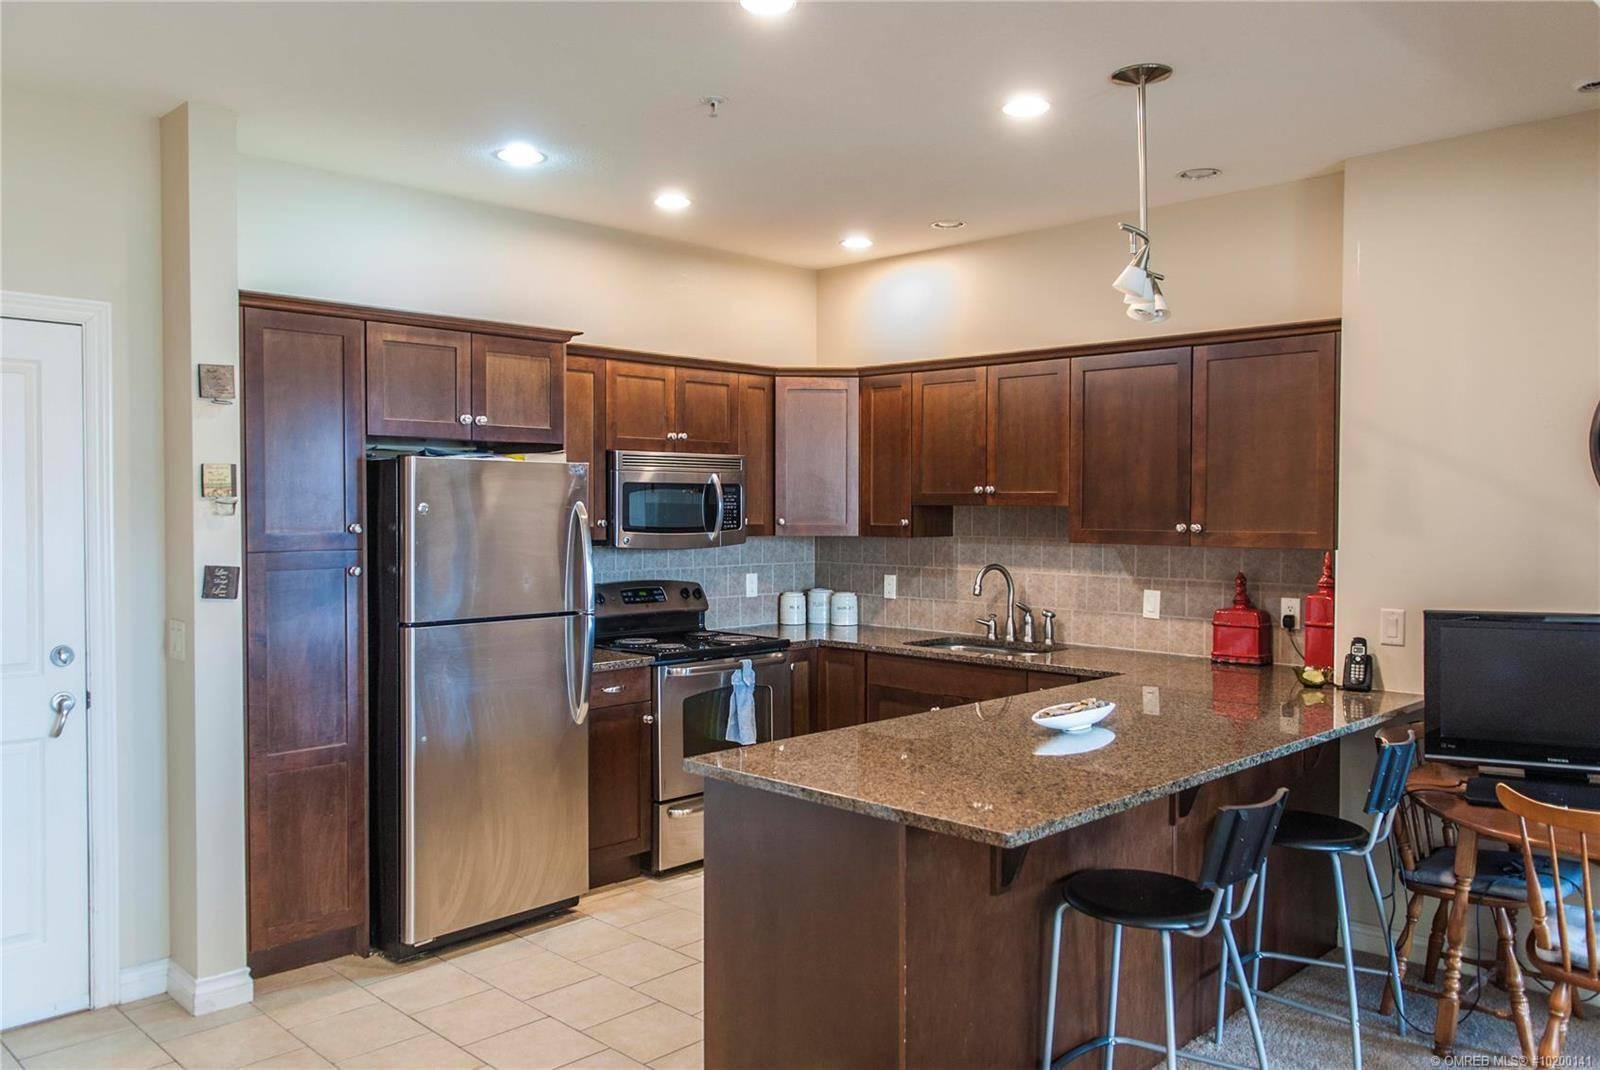 Condo for sale at 3843 Brown Rd Unit 2208 West Kelowna British Columbia - MLS: 10200141